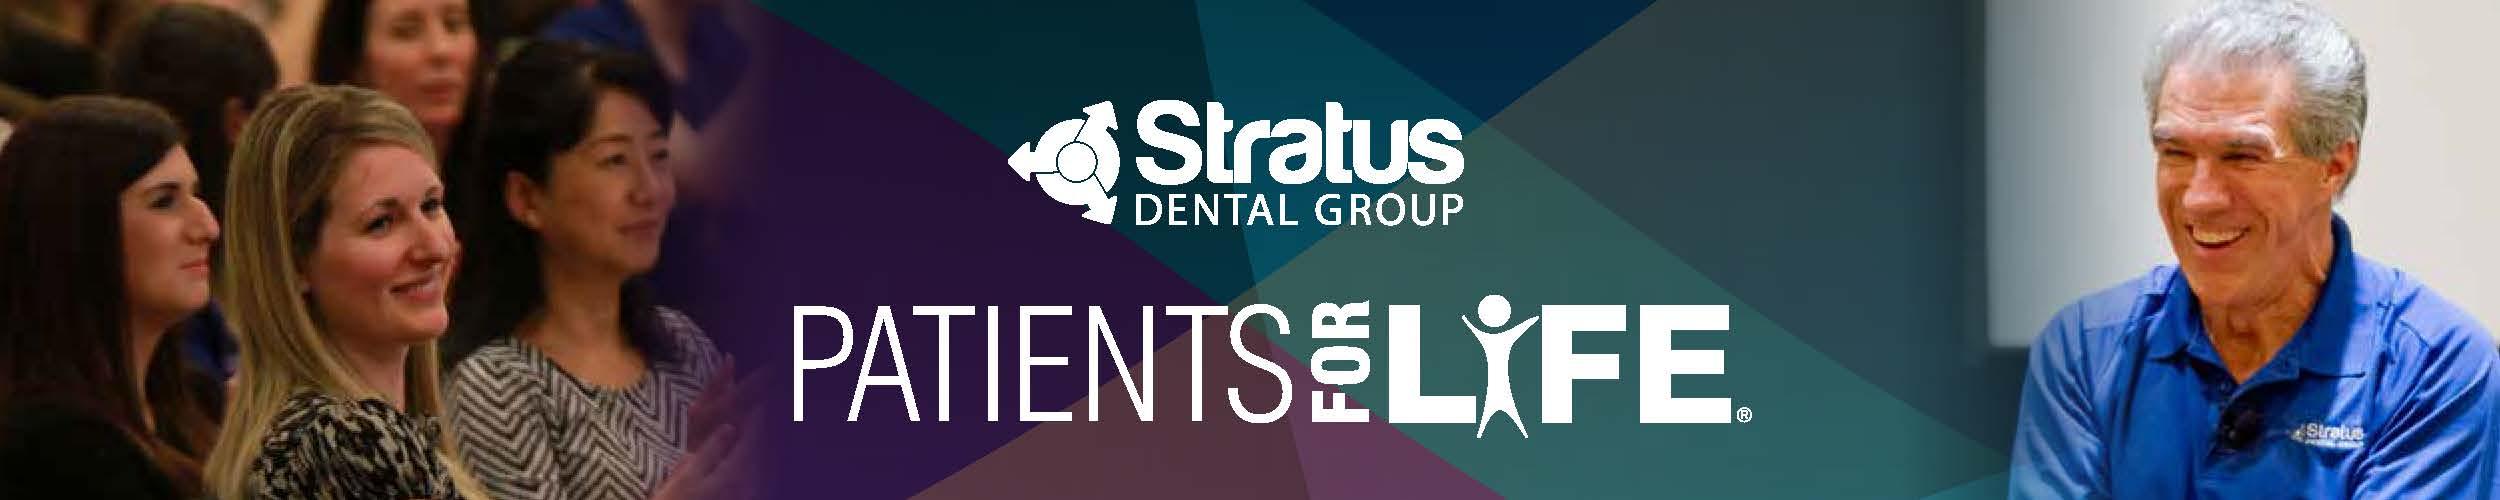 Stratus Patients for Life Workshop Case Acceptance 101 | December 9 & 10, 2016